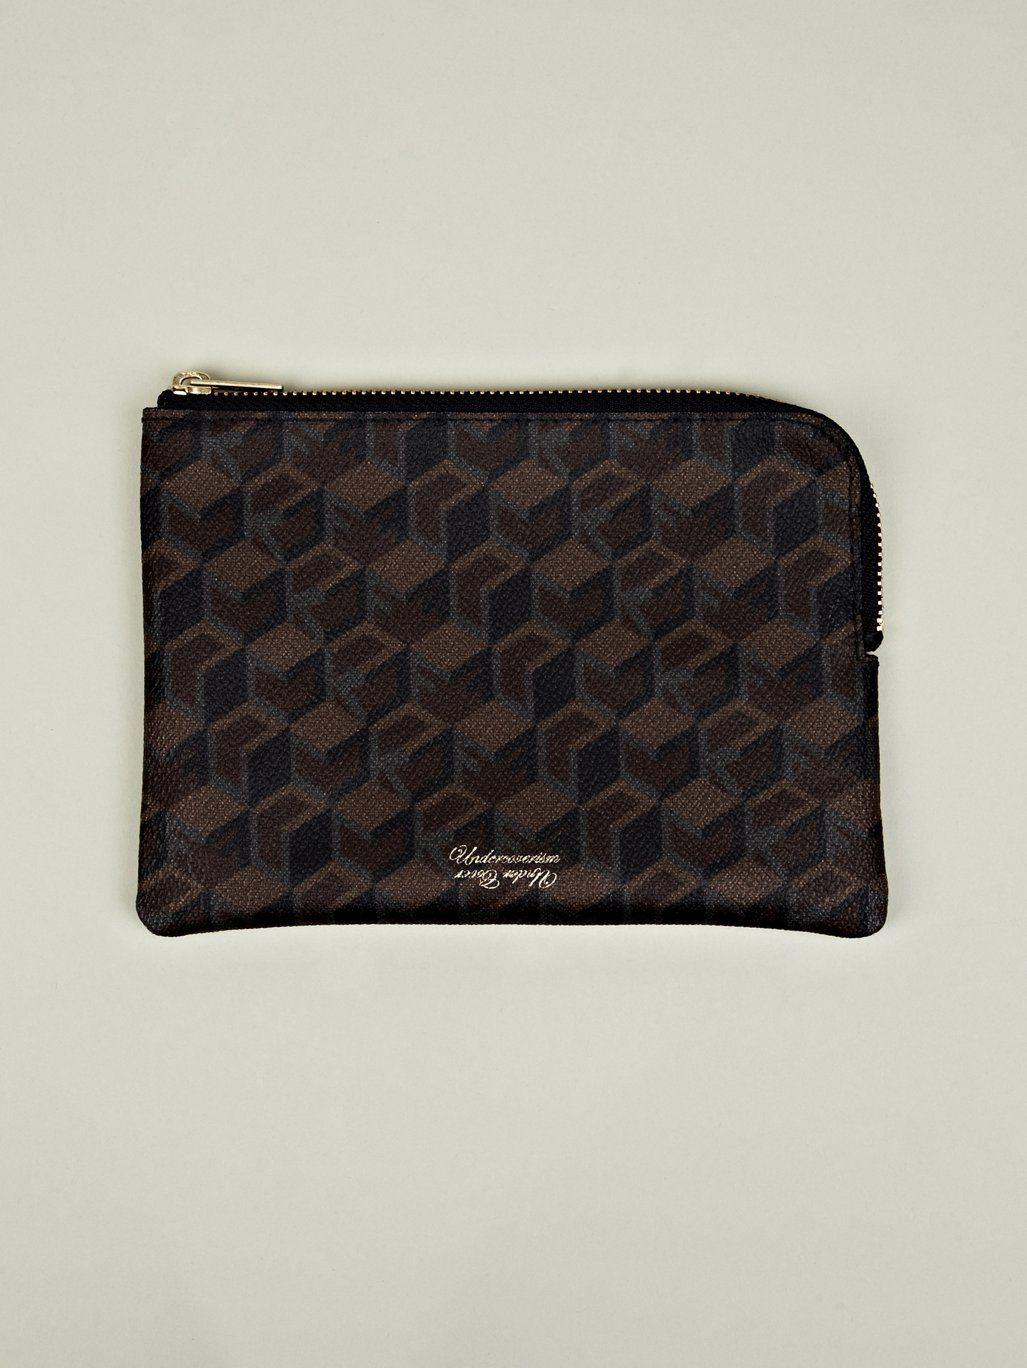 Undercover Medium Zip Wallet | oki-ni £75 (reduced)